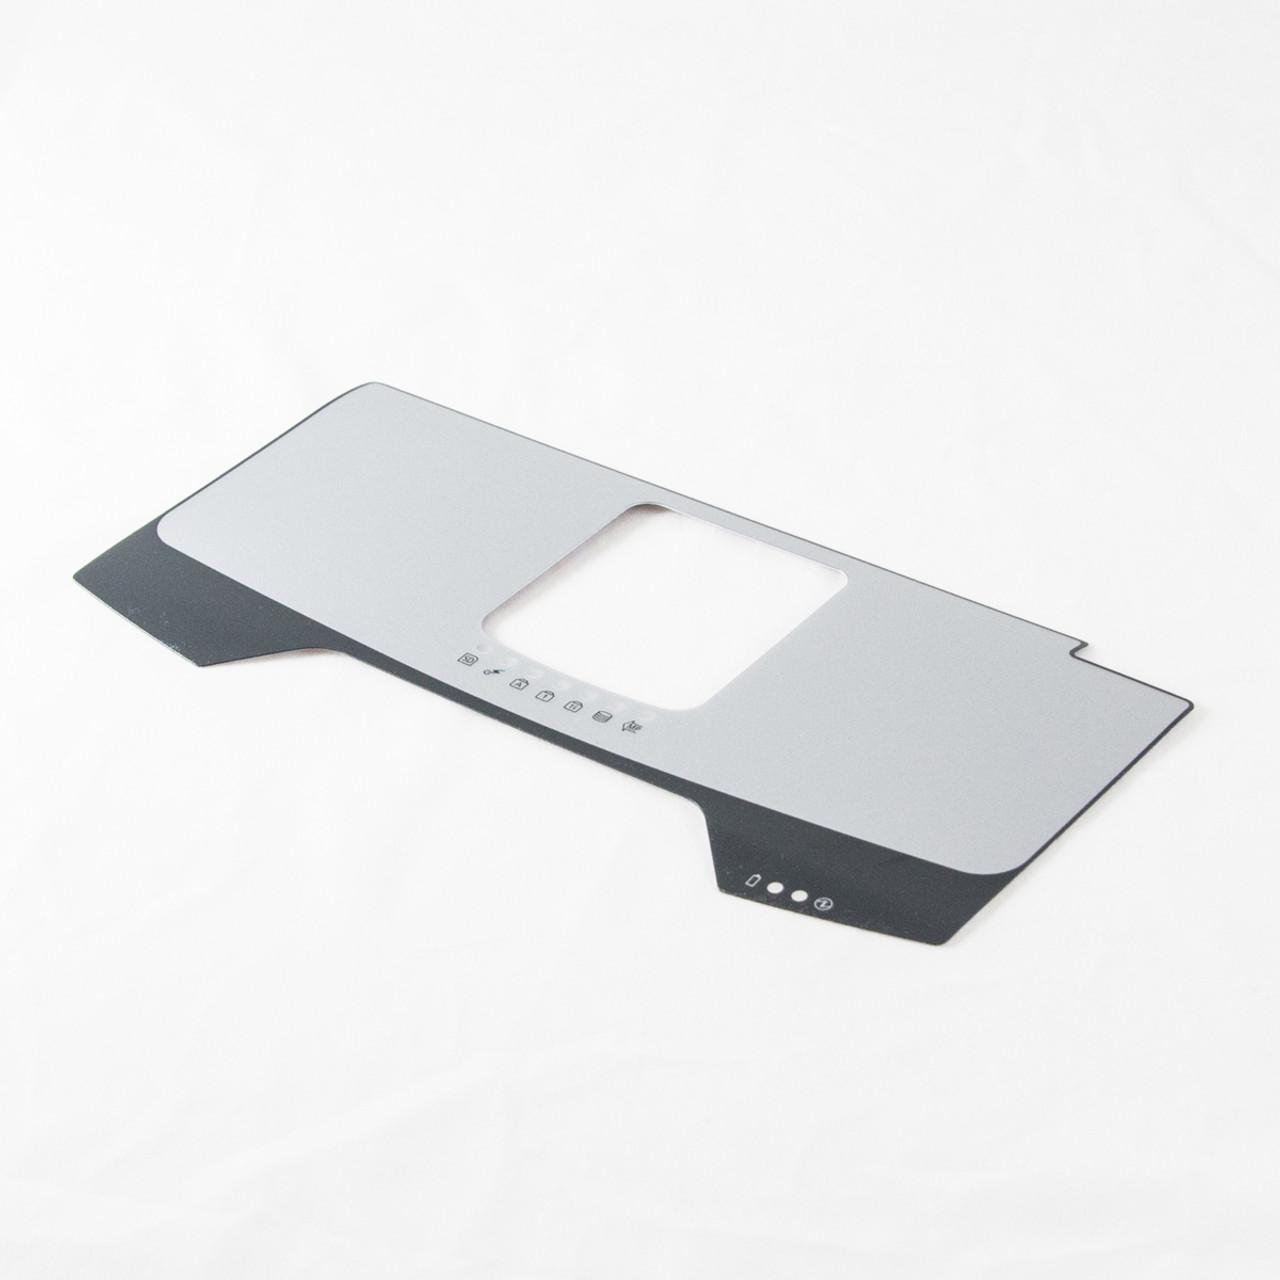 New Panasonic Toughbook CF-31 Laptop Palm Sticker